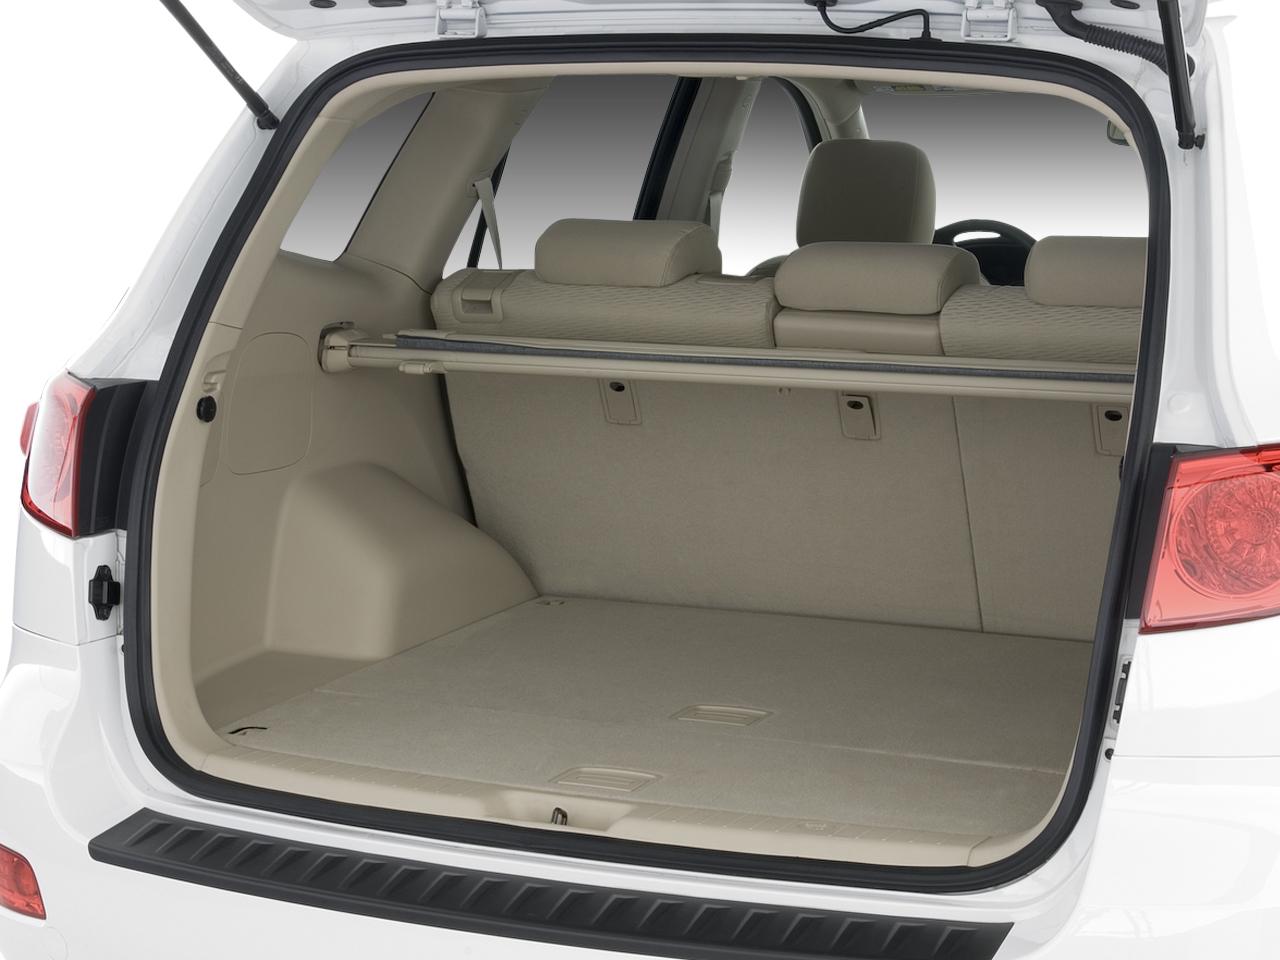 2007 hyundai santa fe car review road test. Black Bedroom Furniture Sets. Home Design Ideas